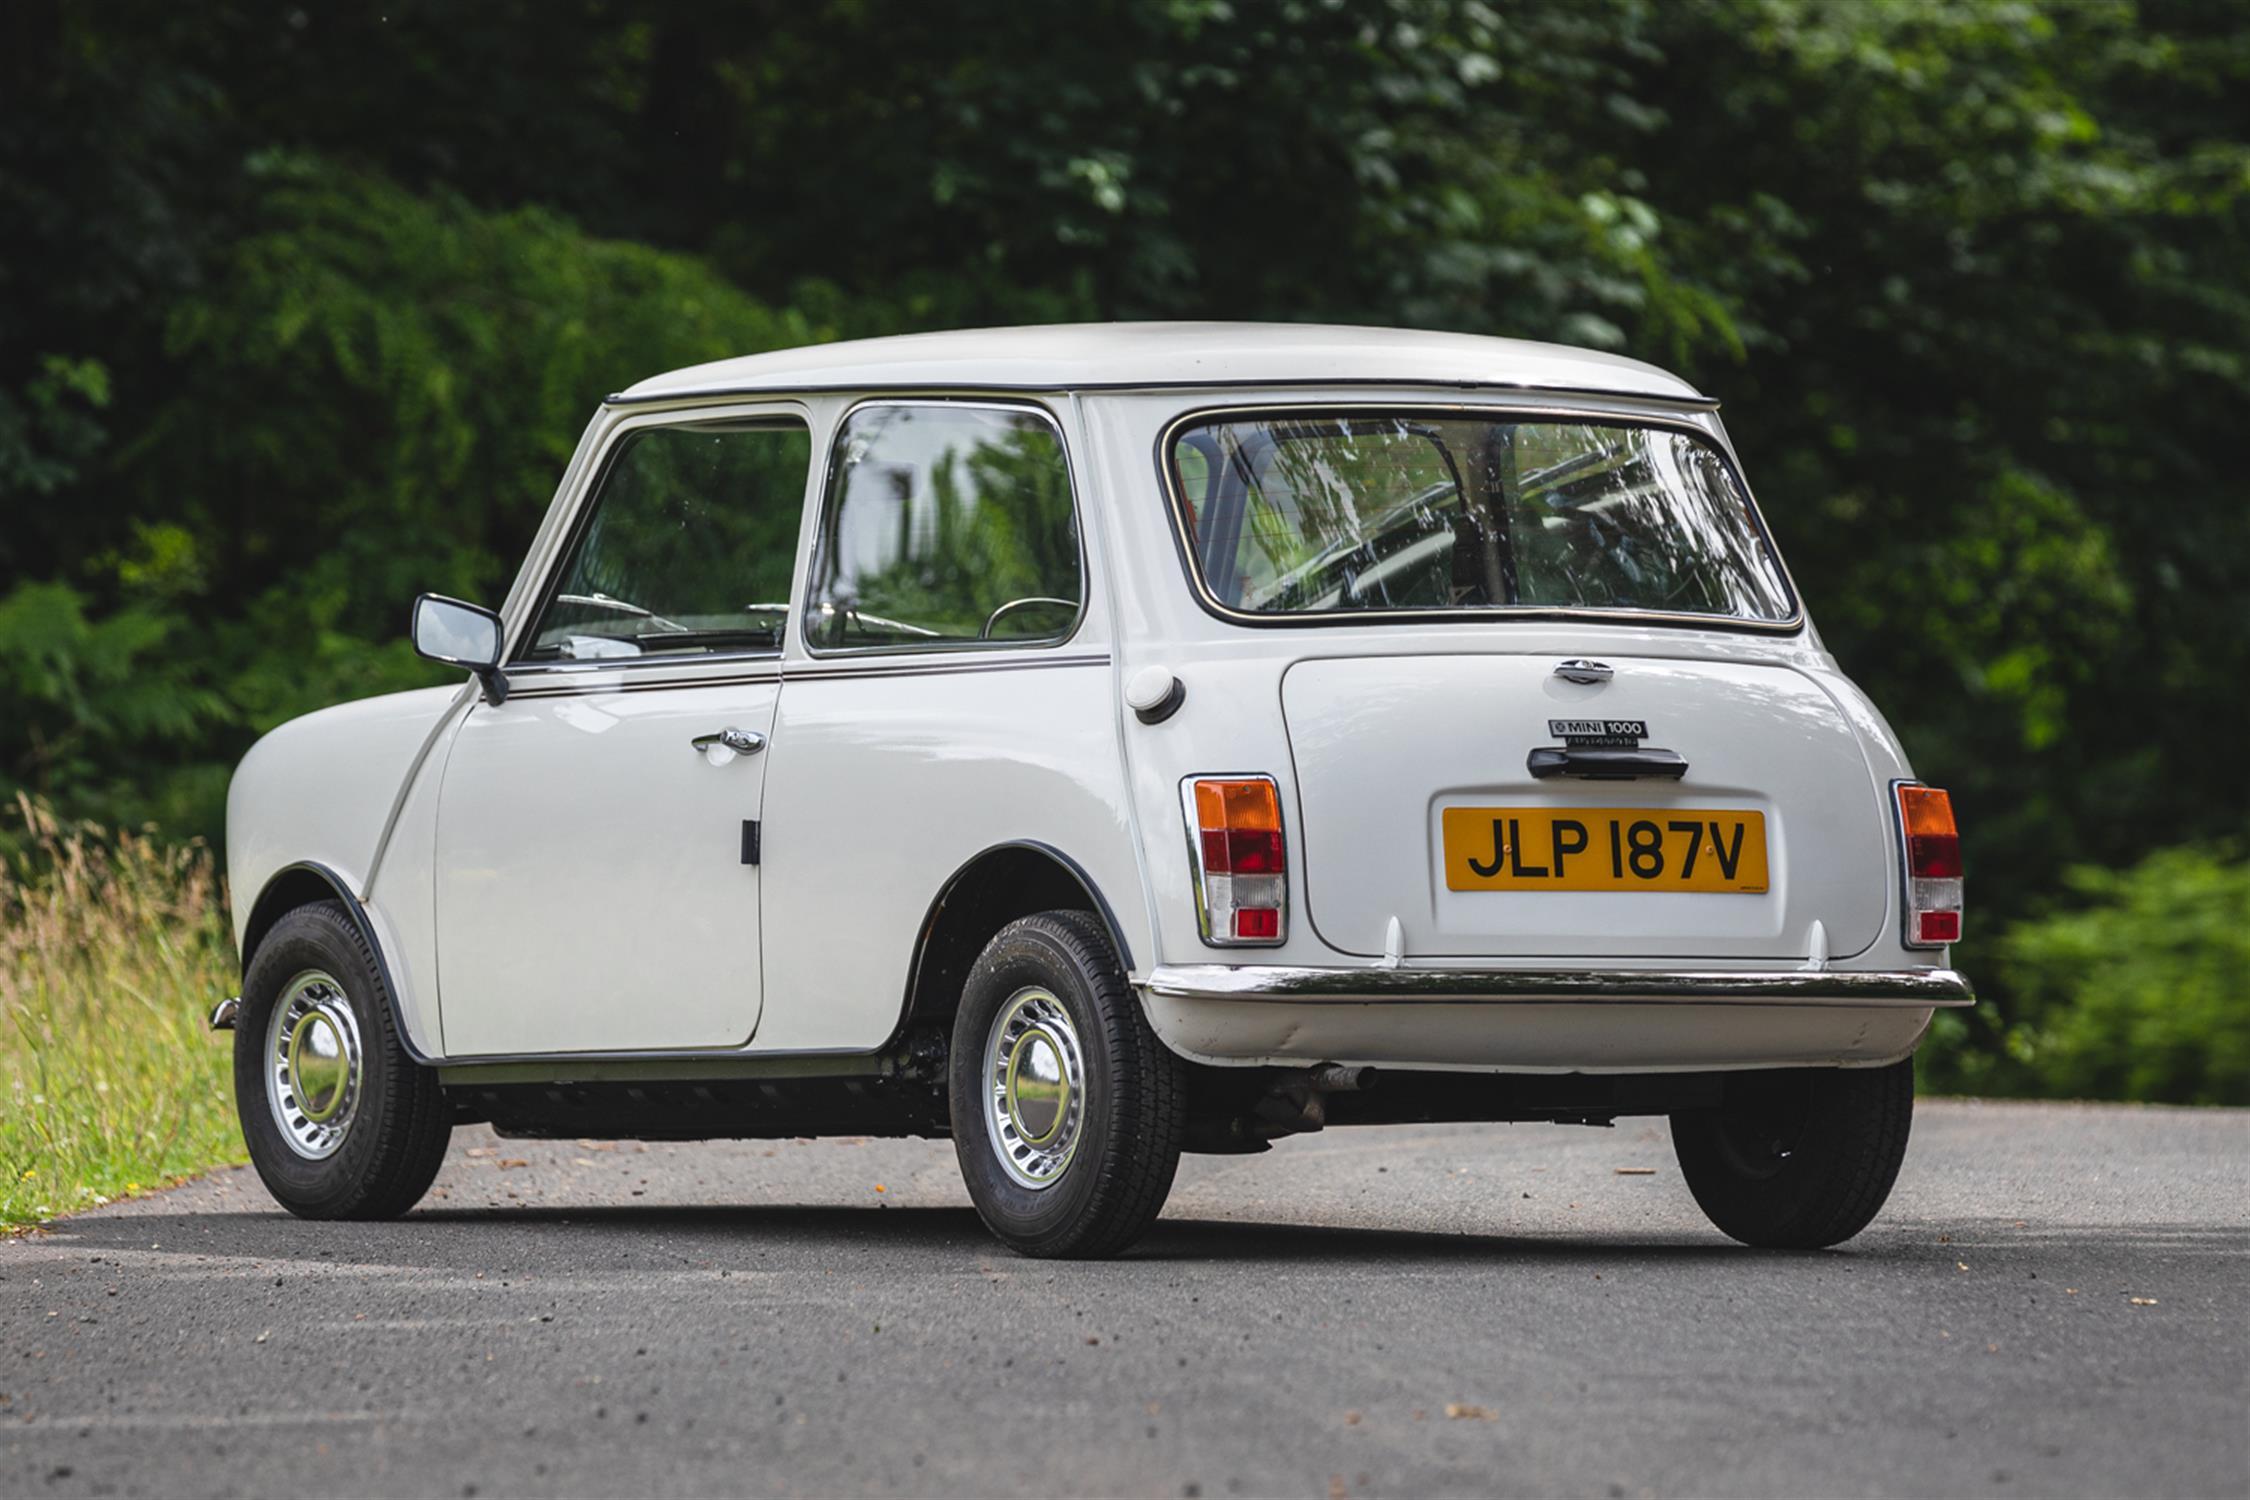 1979 Austin Mini 1000 (Auto) - 2,699 Miles - Image 2 of 10